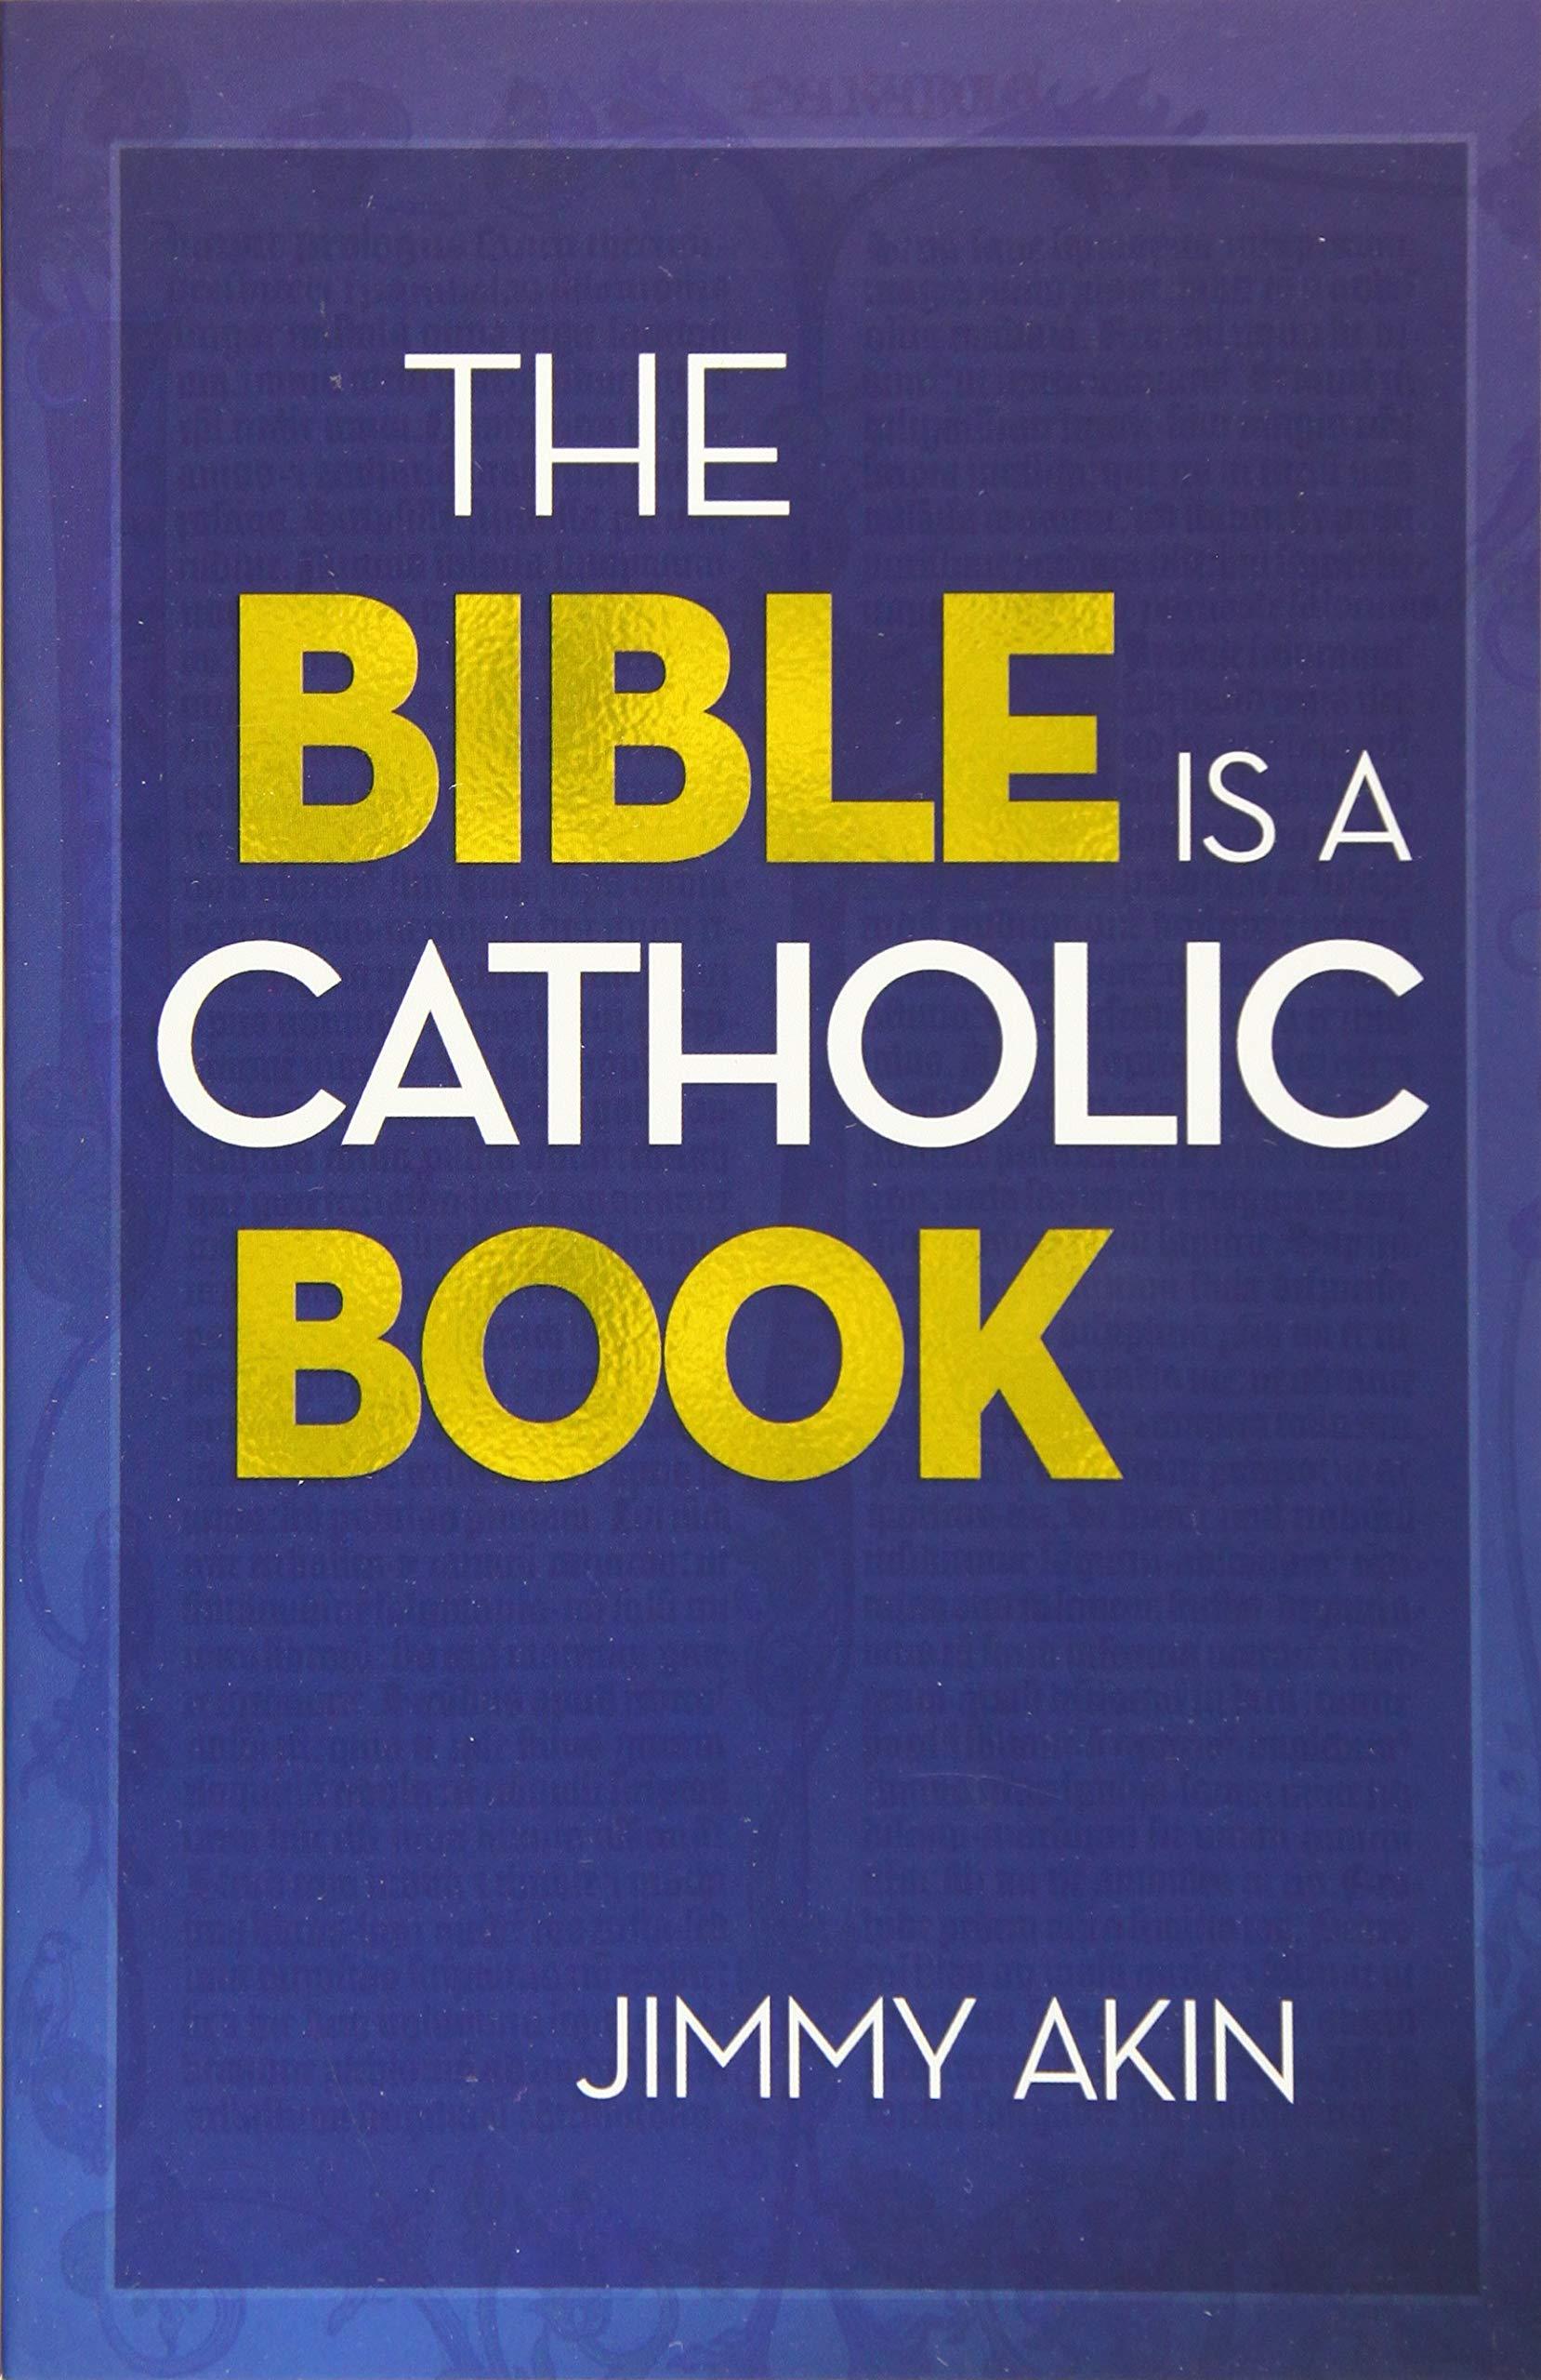 The Bible Is a Catholic Book: Jimmy Akin: 9781683571414: Amazon.com: Books